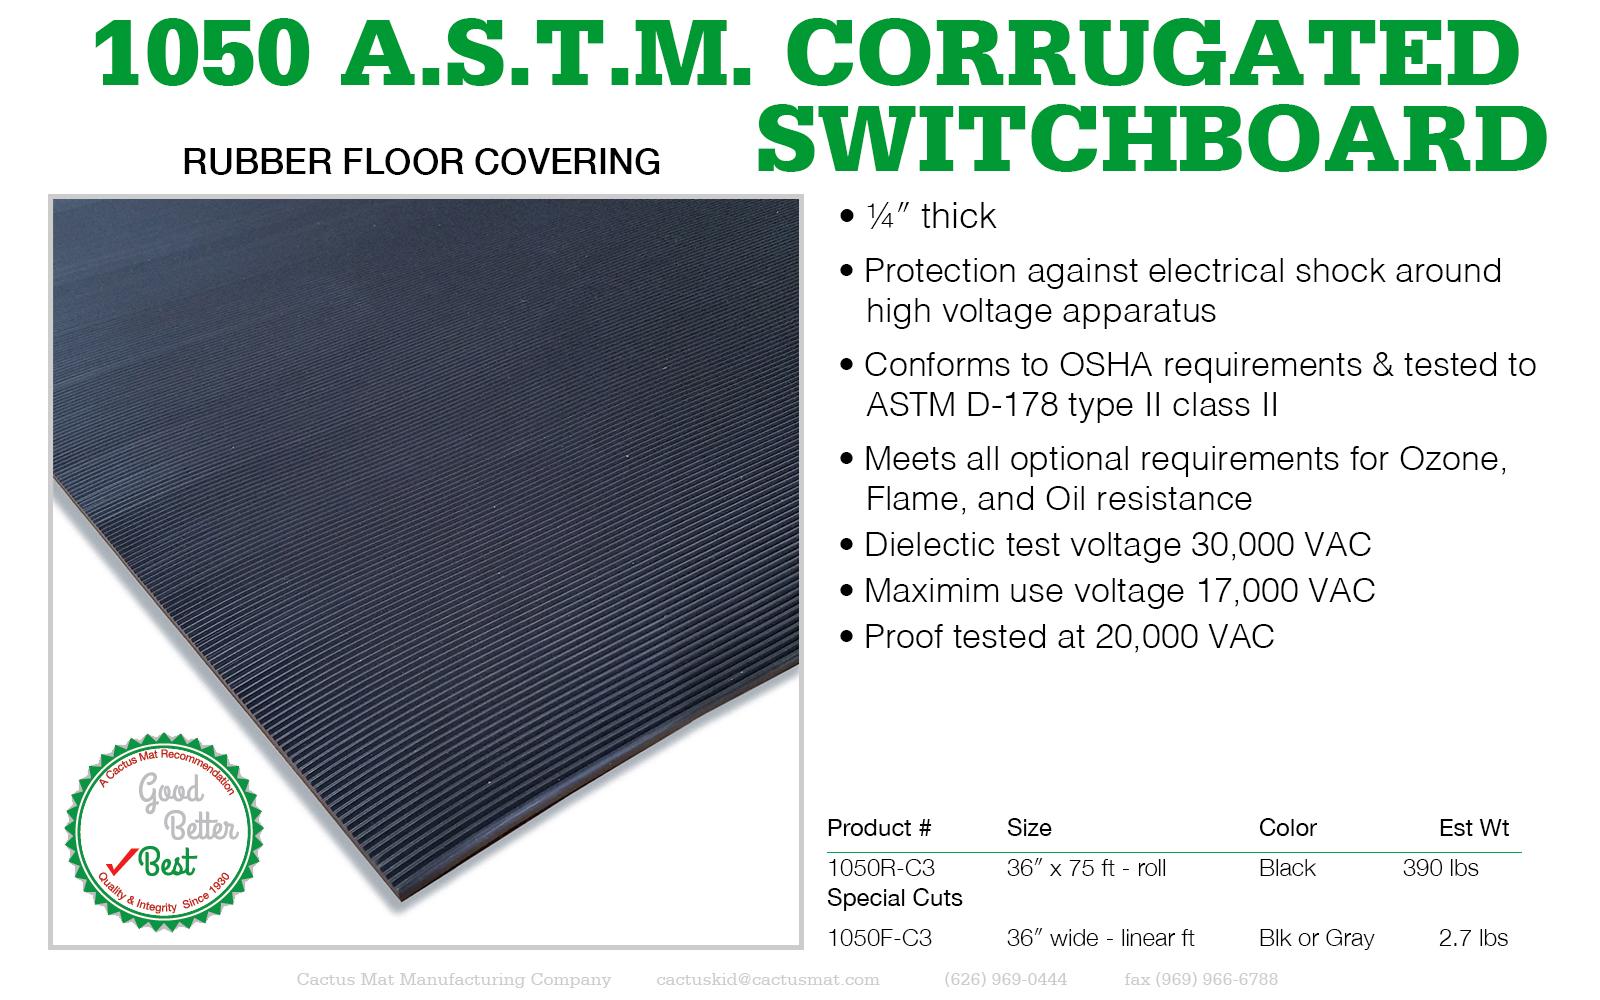 1050_ASTM CorrSwitchboard.jpg